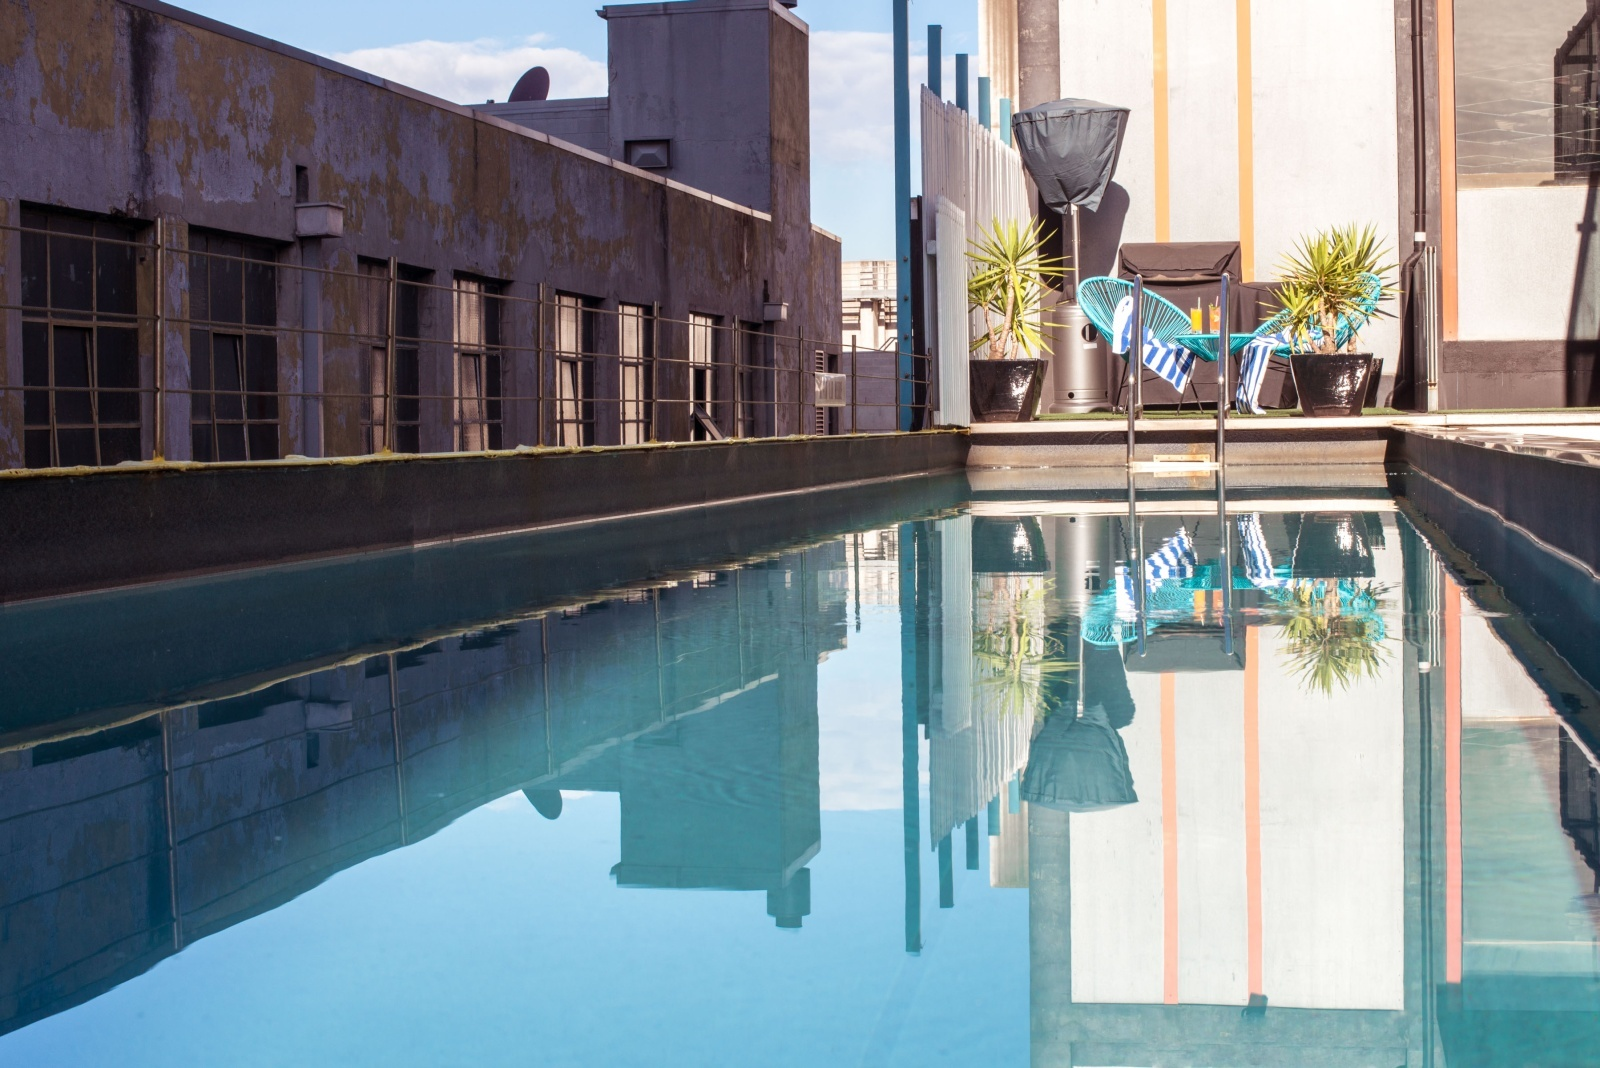 Adelphi hotel melbourne - Adelphi hotel melbourne swimming pool ...